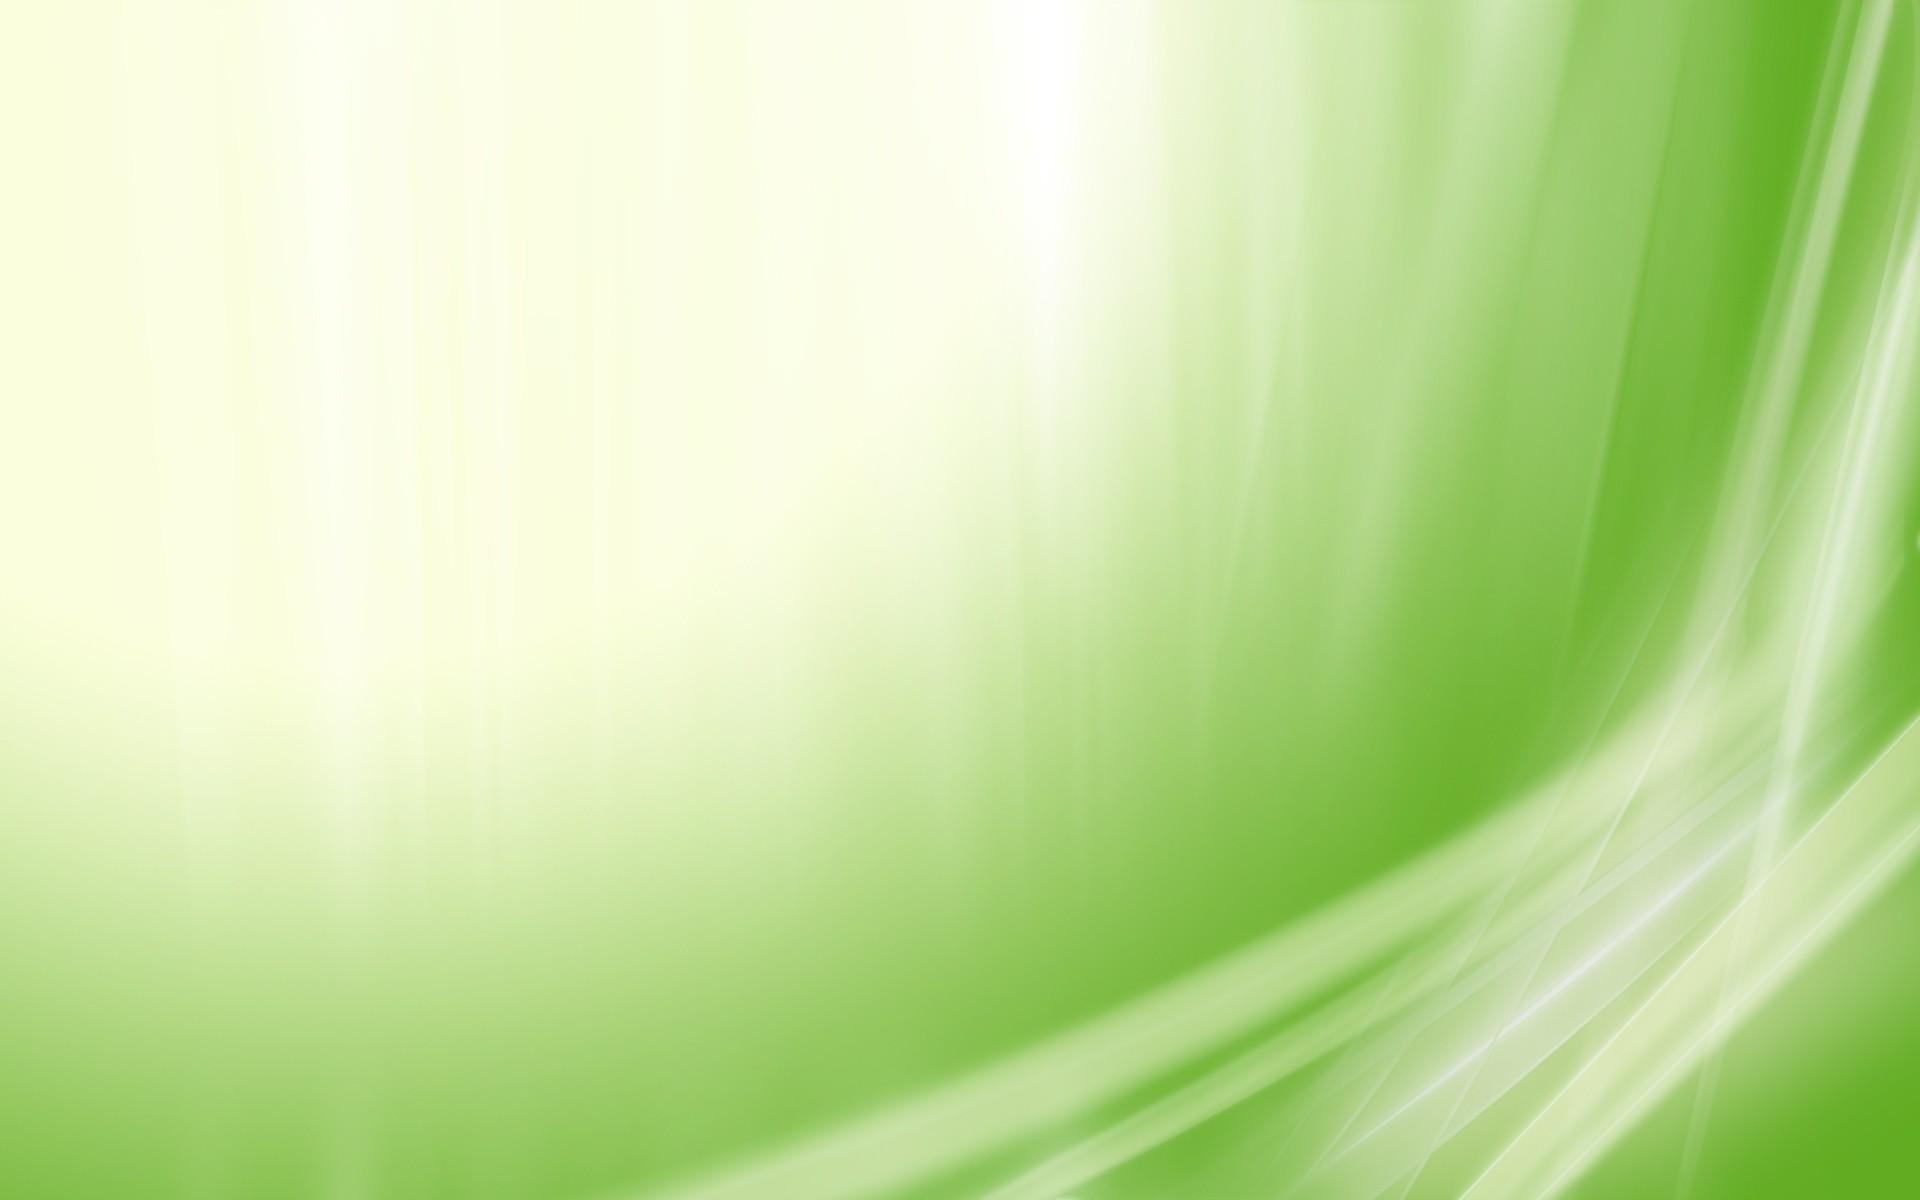 Free Landscape Wallpaper Hd Green Background 21867 1920x1200px